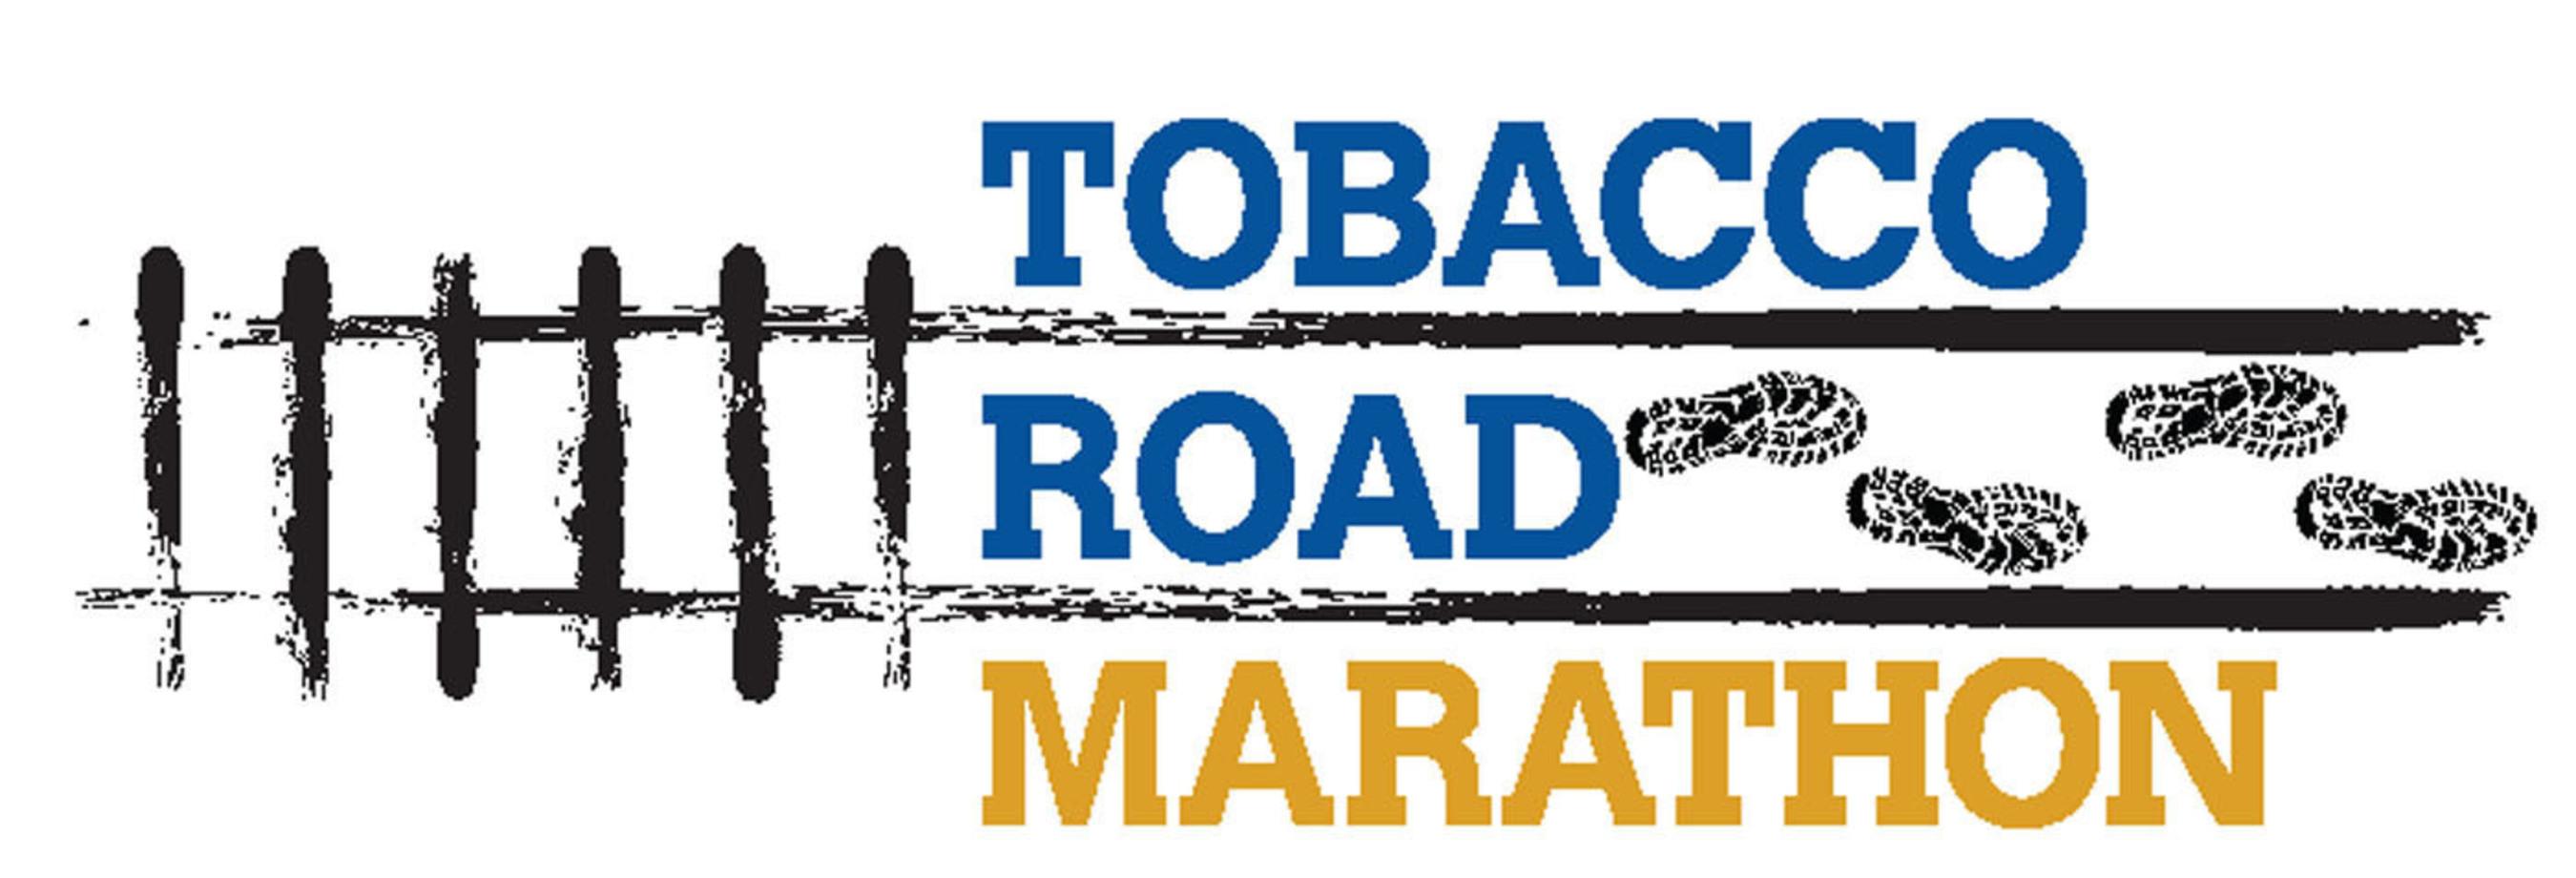 Tobacco Road Marathon http://tobaccoroadmarathon.com/.